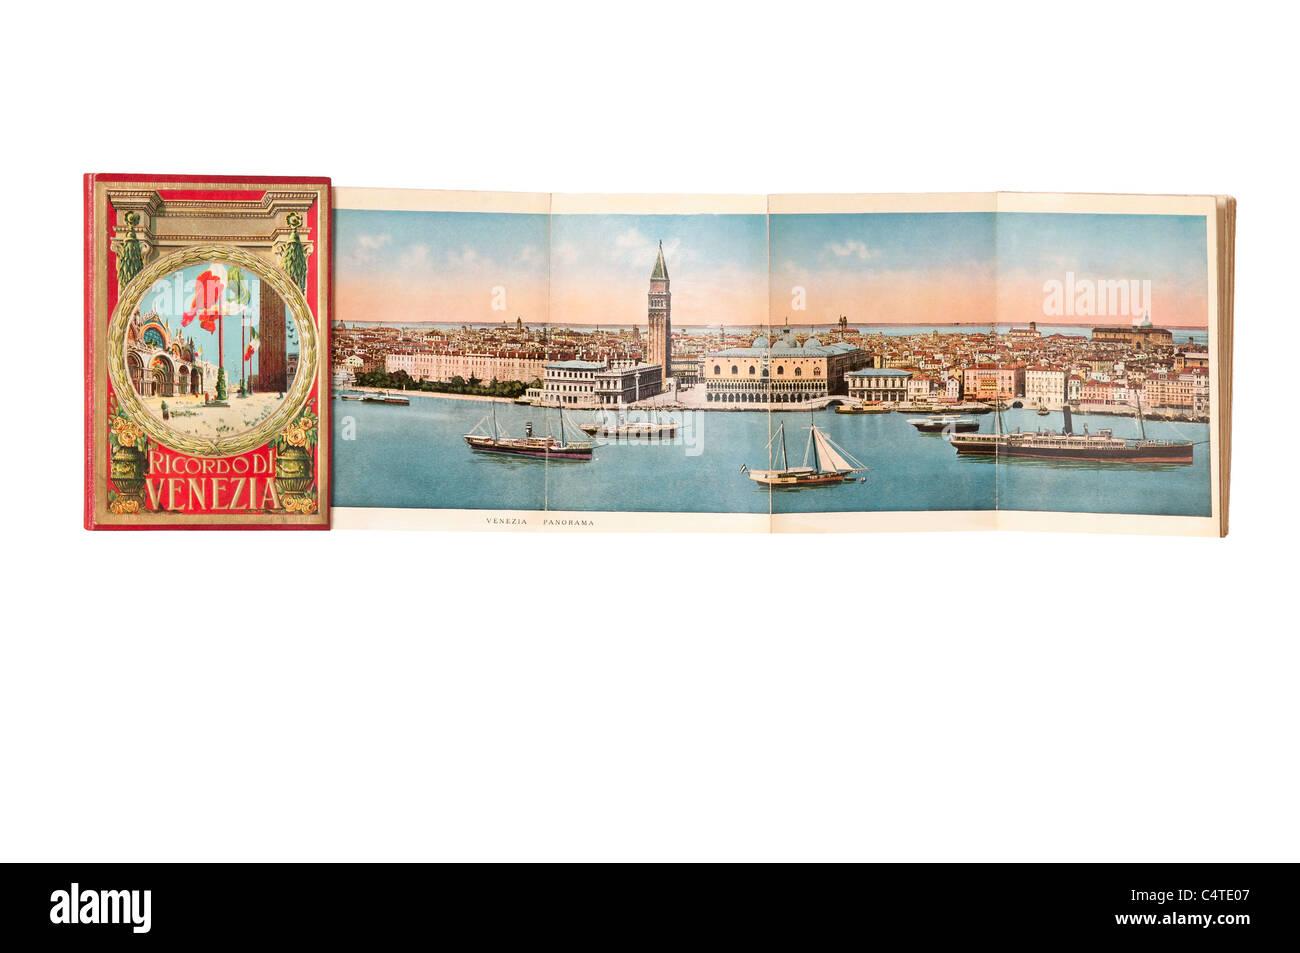 postcard folder of remembering from Venice early twentieth century - Stock Image